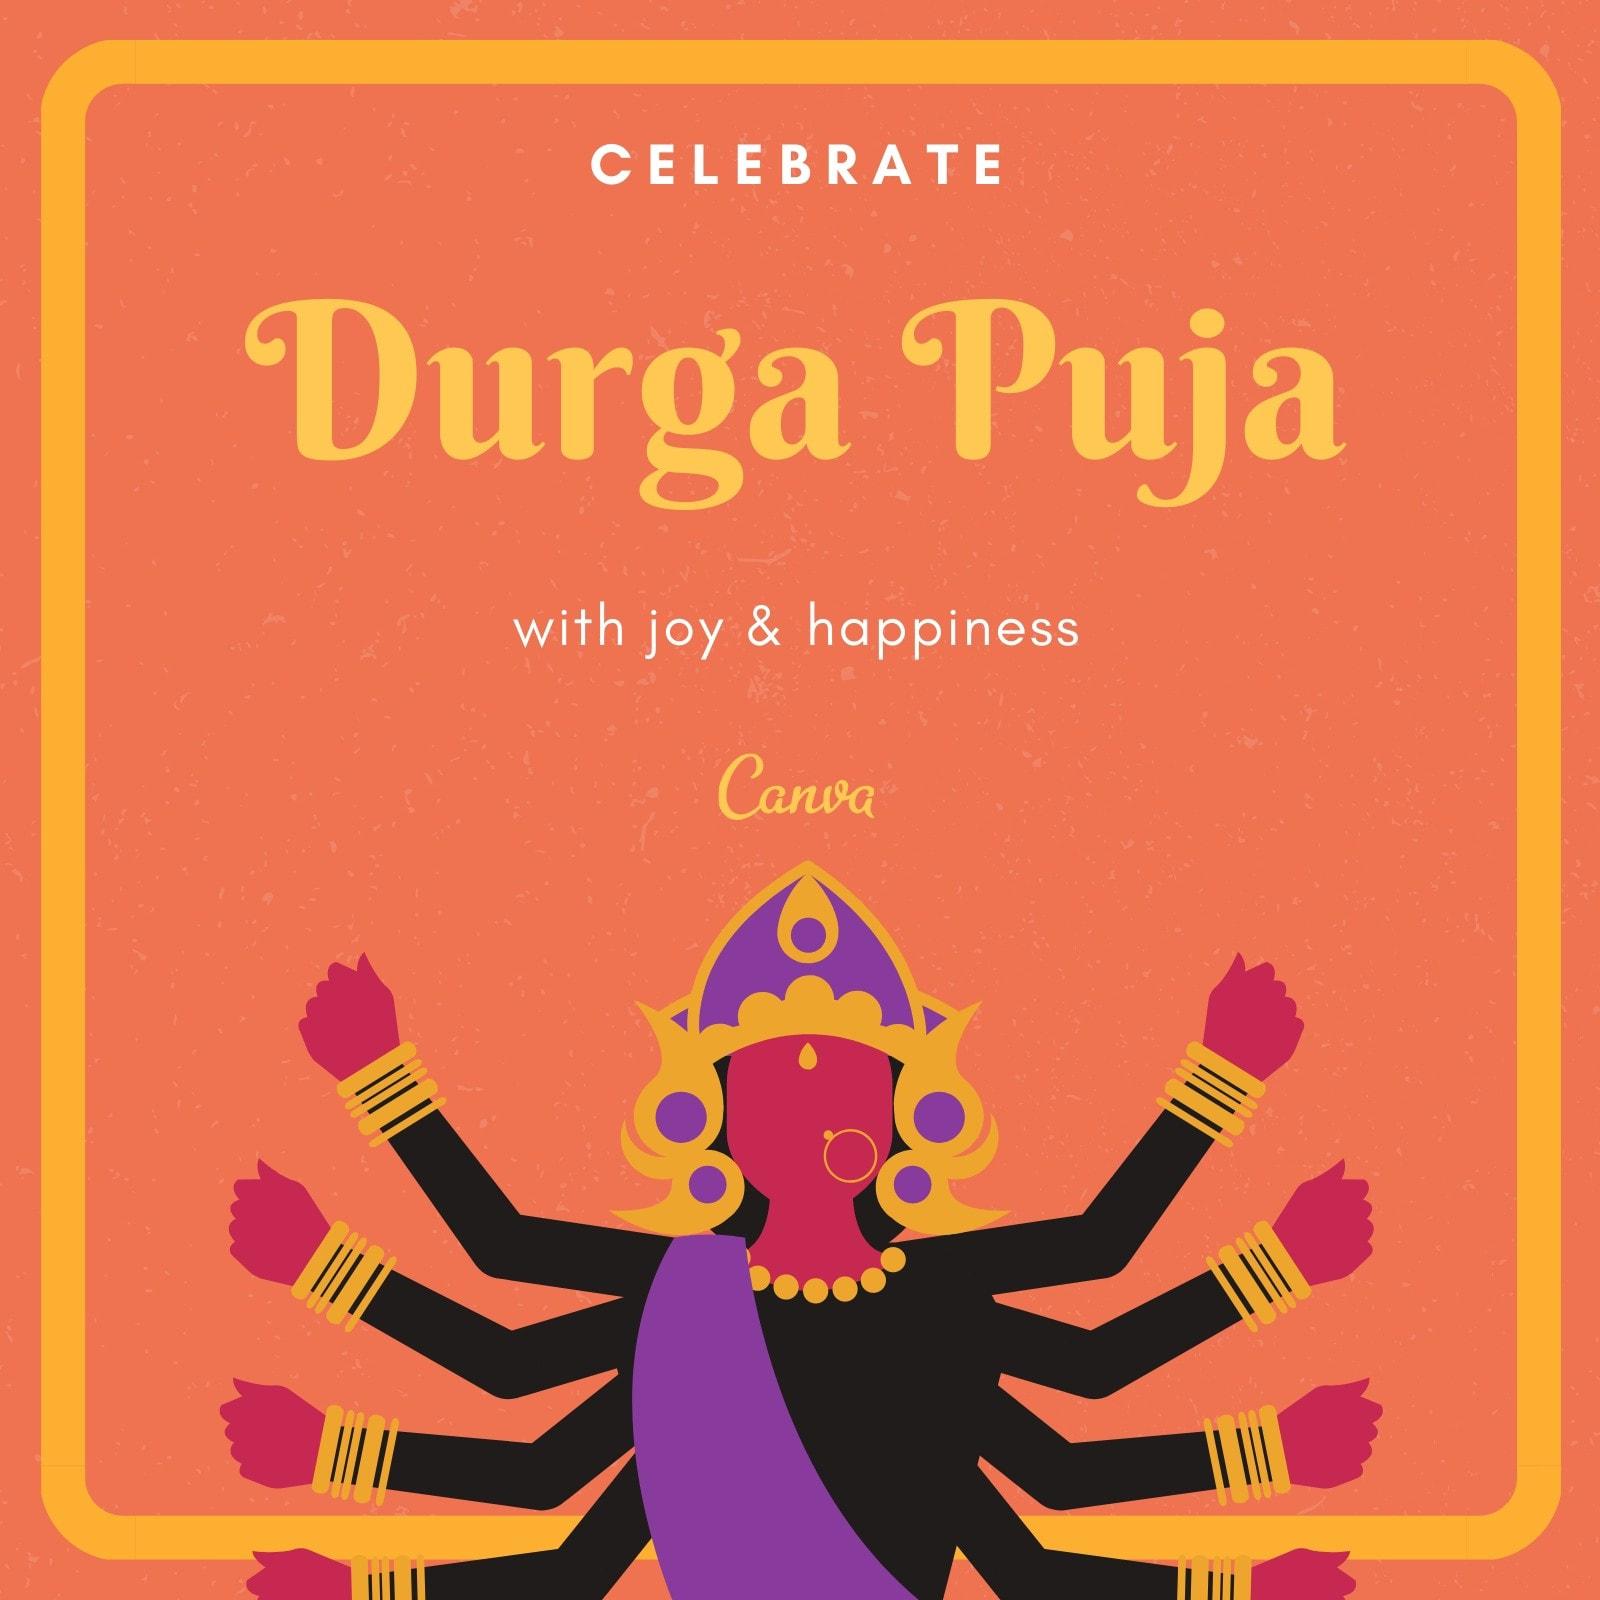 Orange Yellow Plain Durga Puja Instagram Post